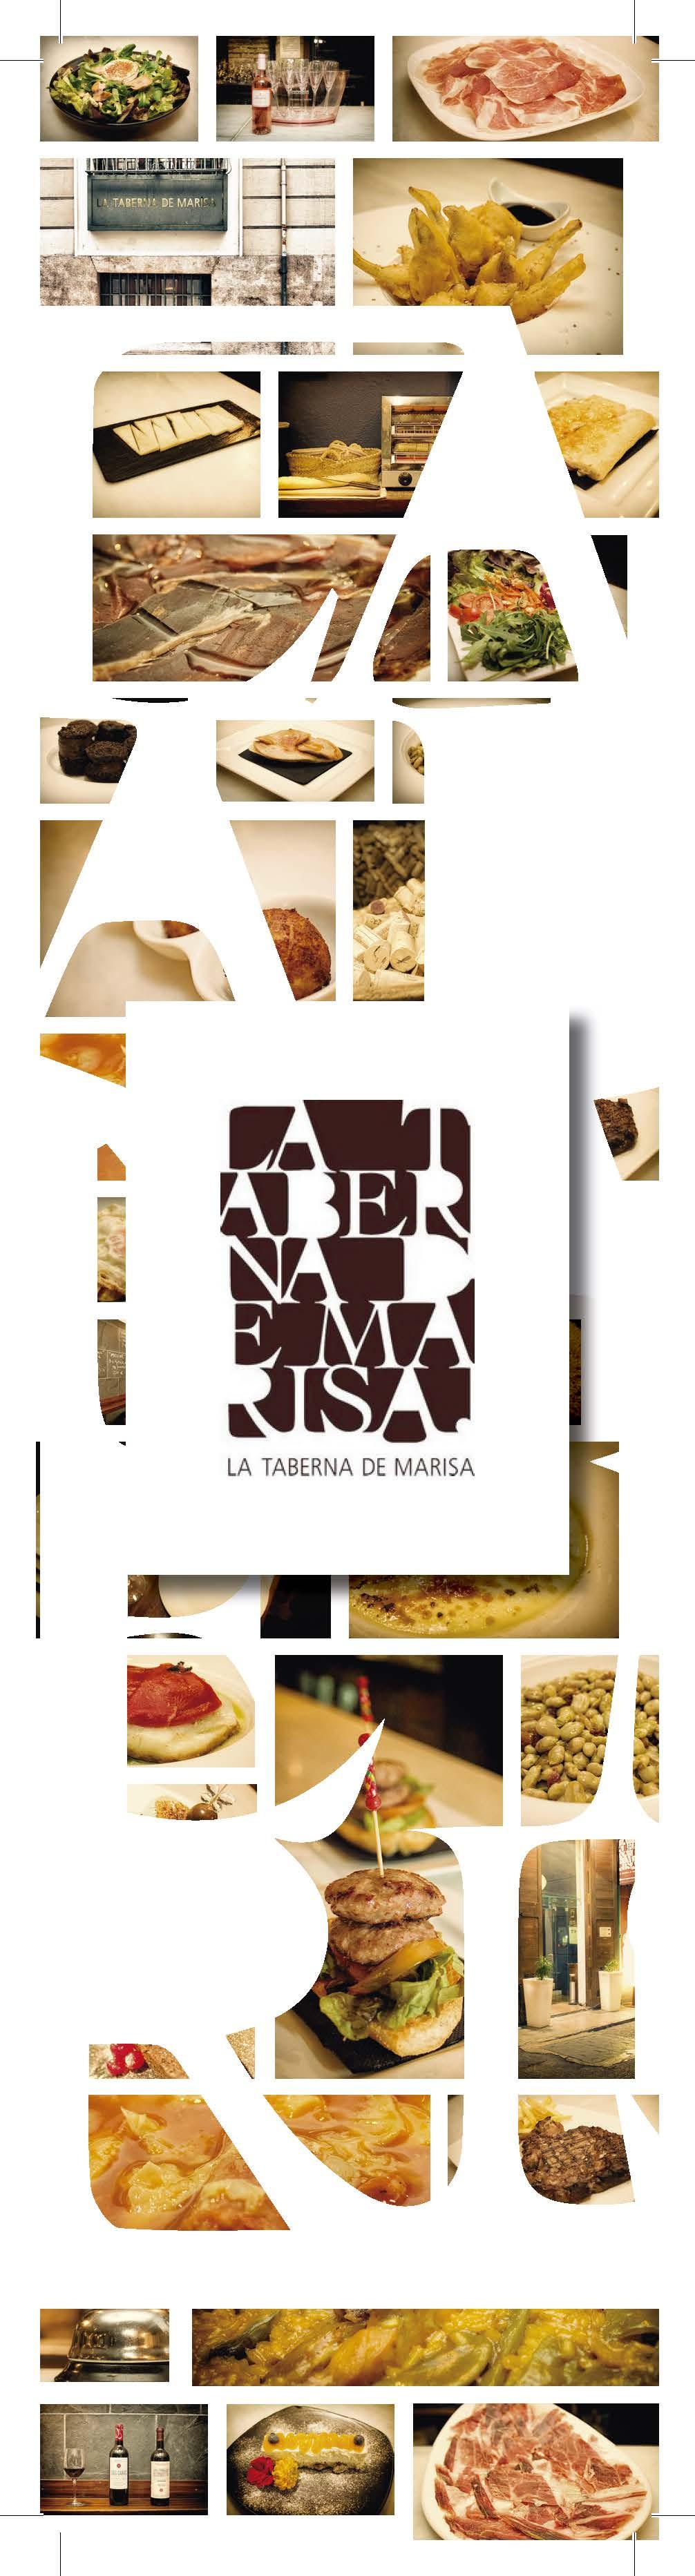 carta_marisa_ord_Página_01